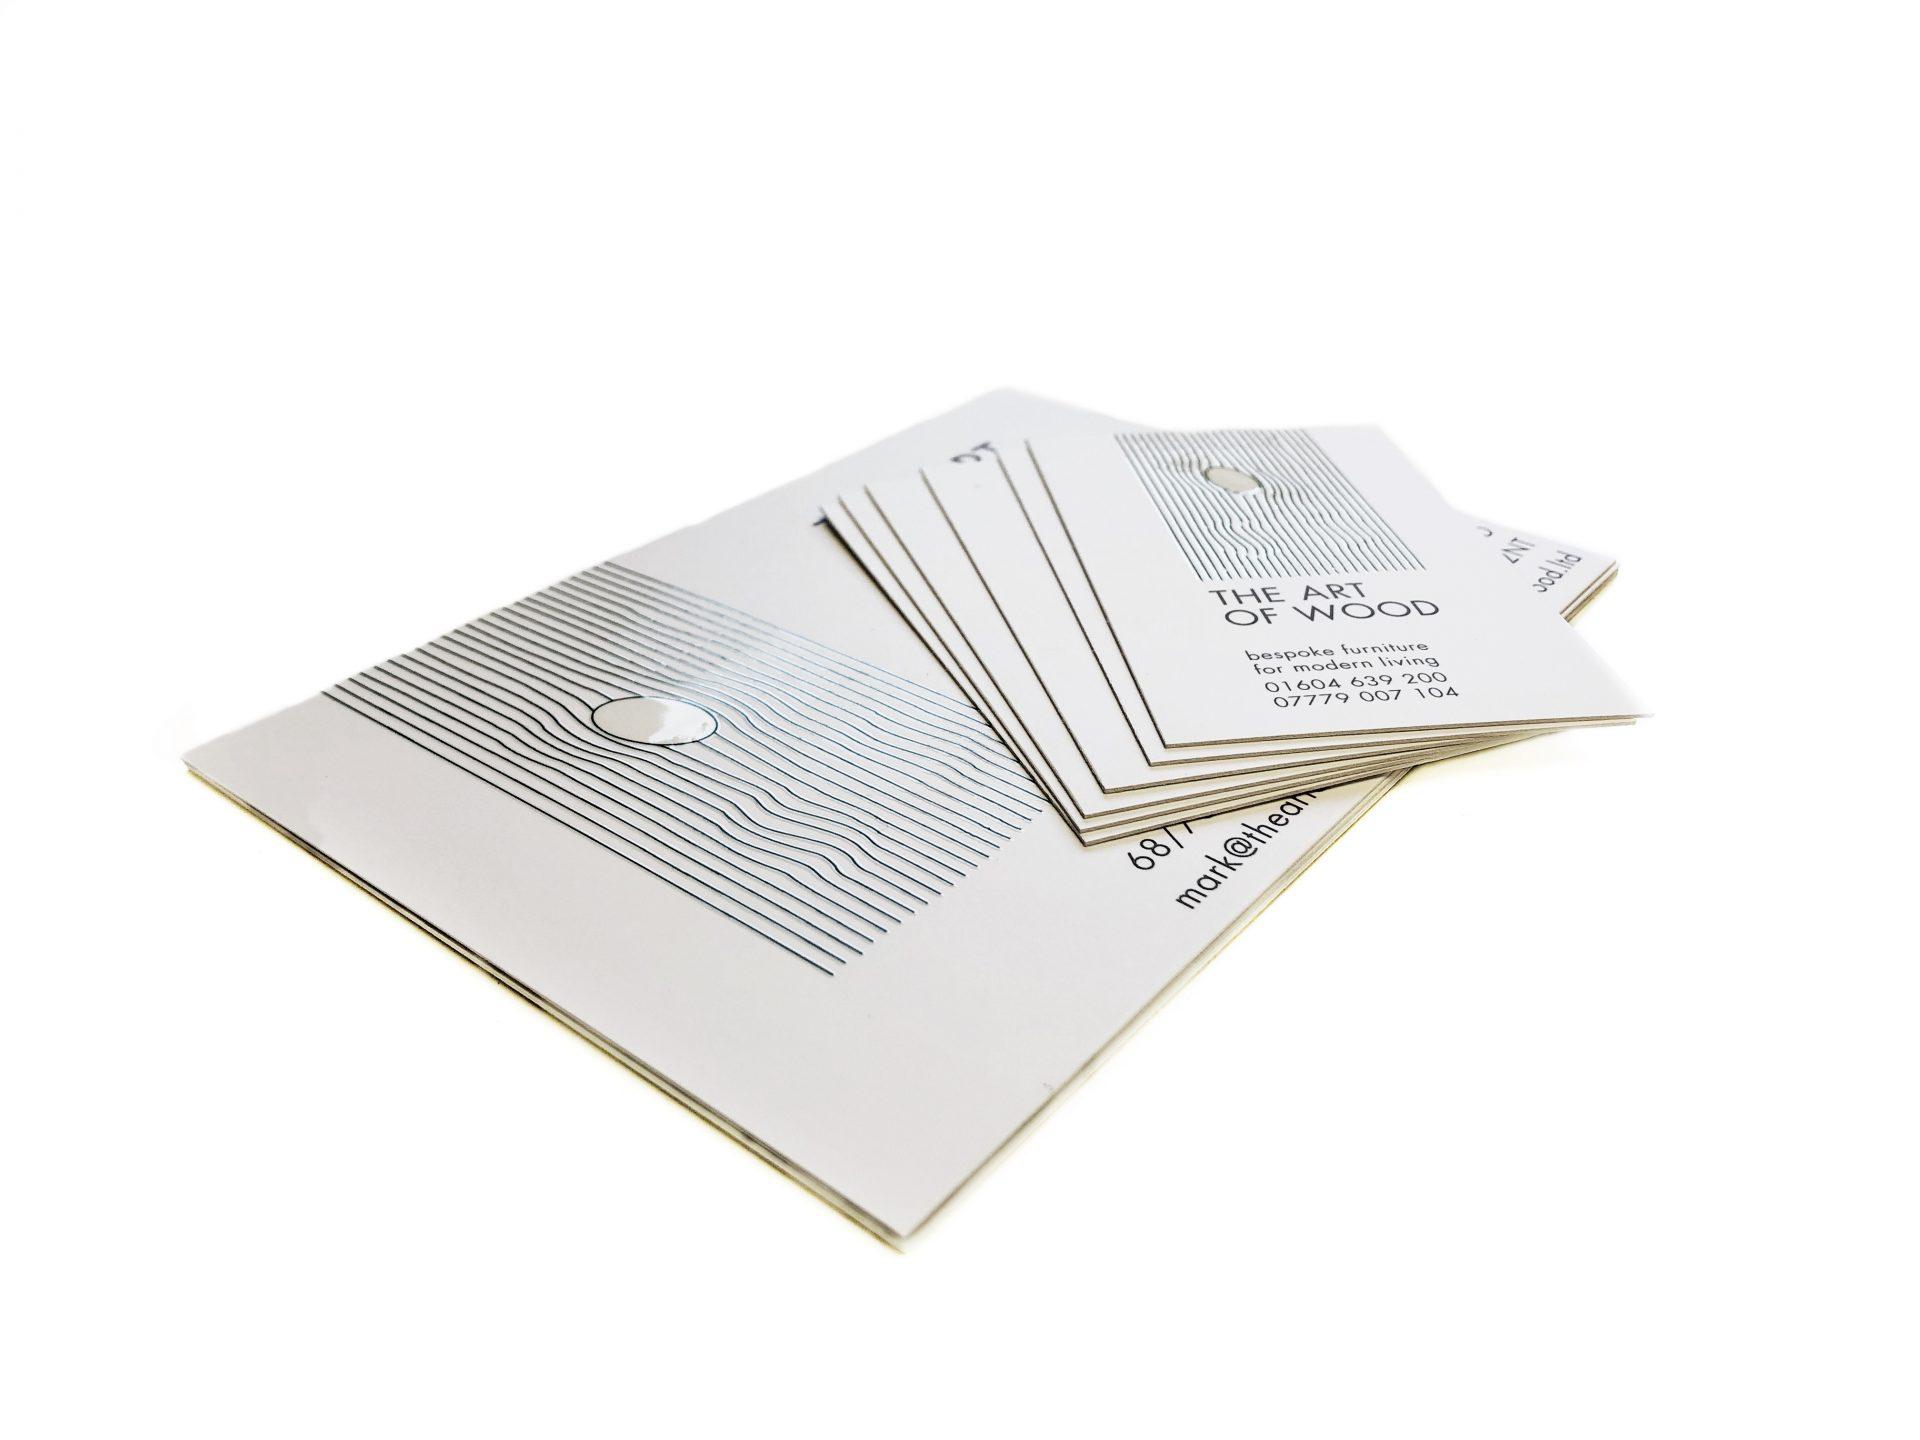 Business Cards & Postcards